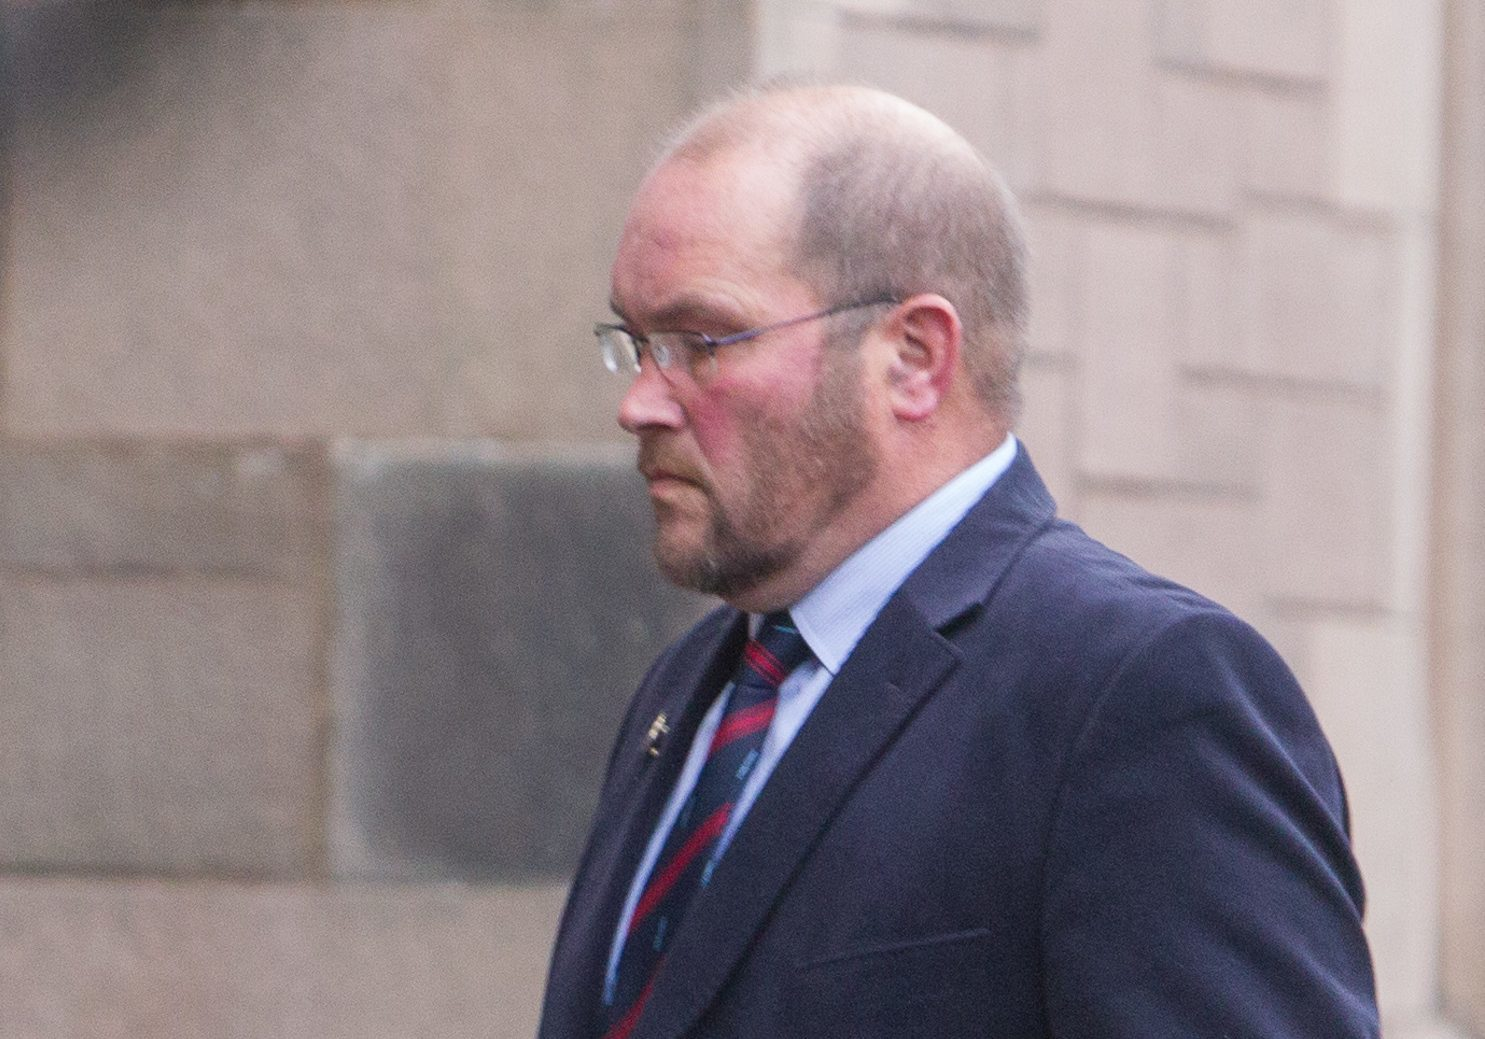 Edward Bennison at Forfar sheriff court